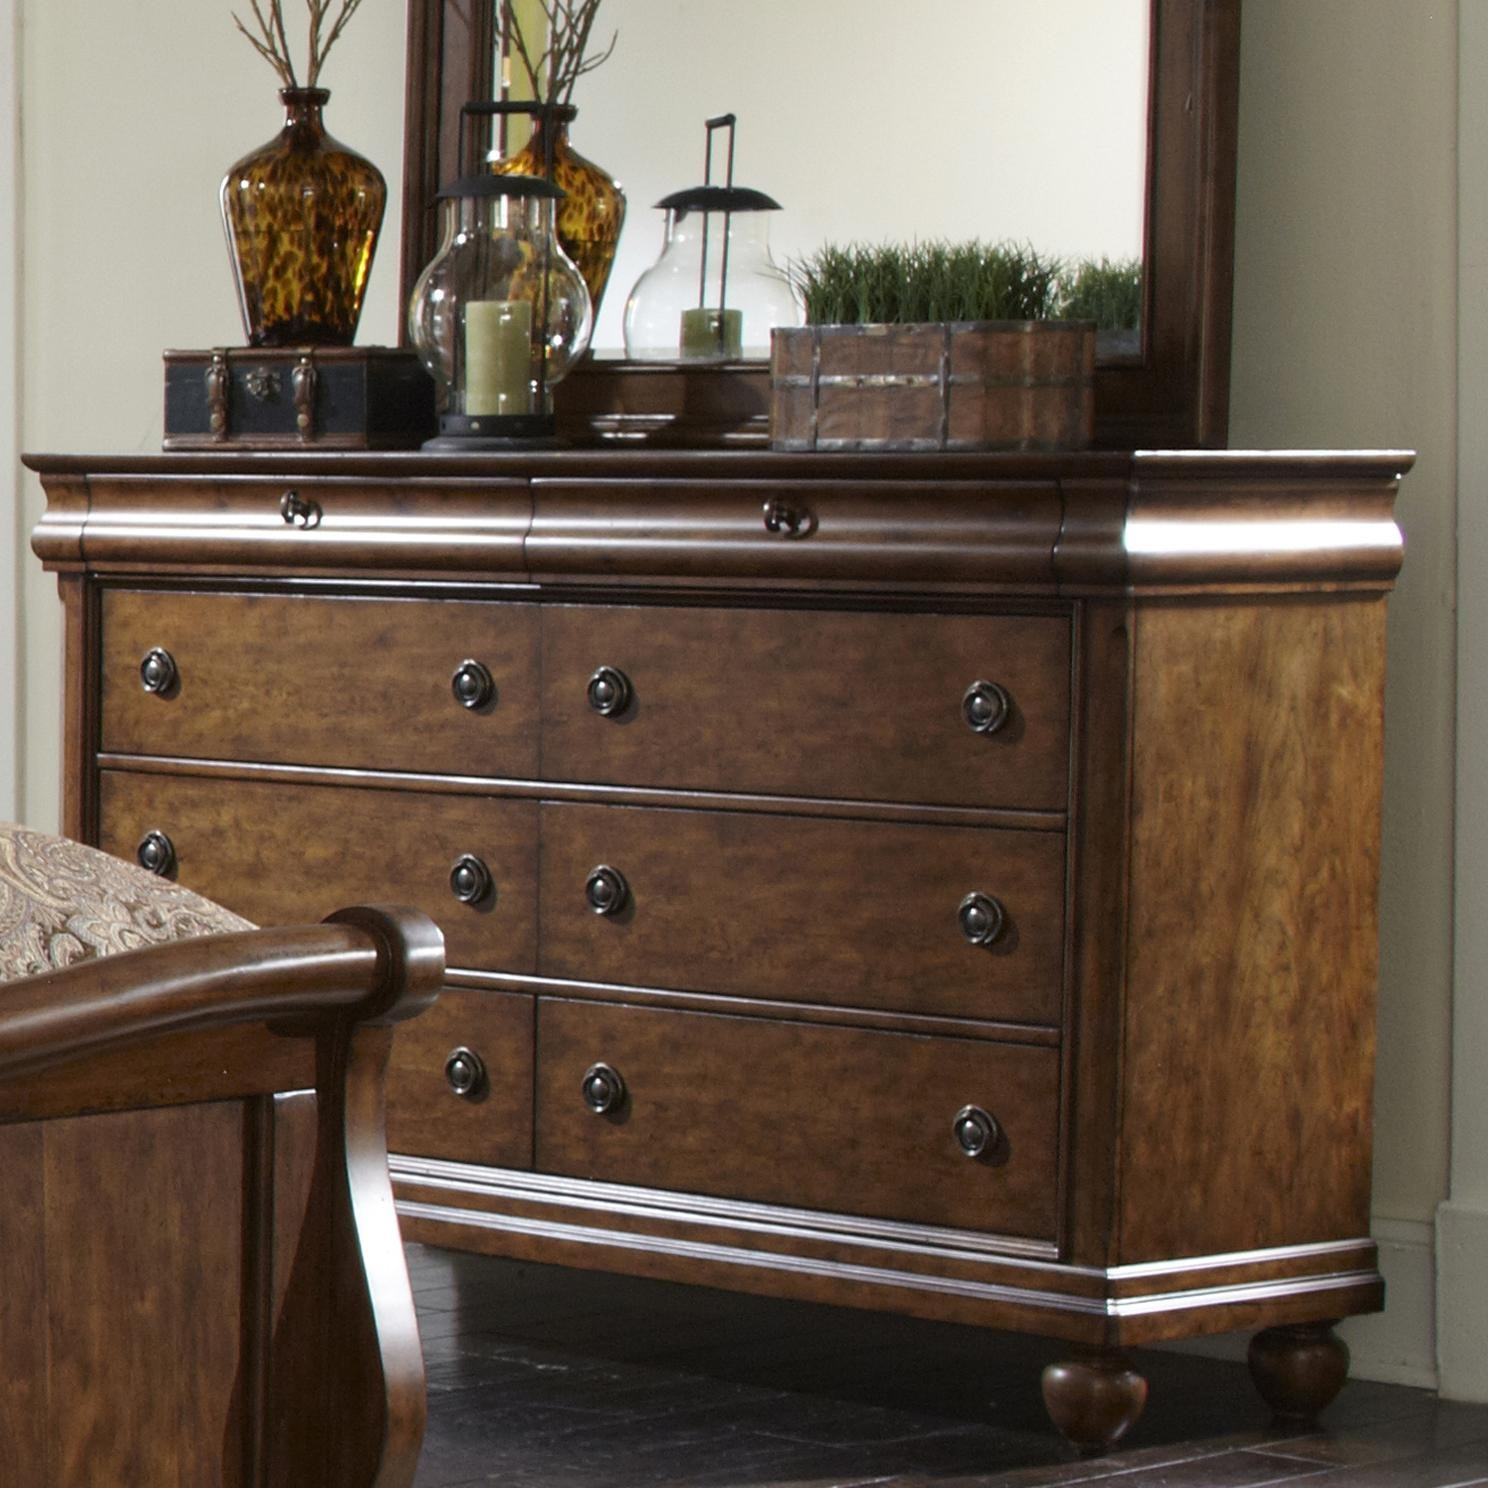 Charmant Brigham Eight Drawer Dresser With Antique Brass Hardware